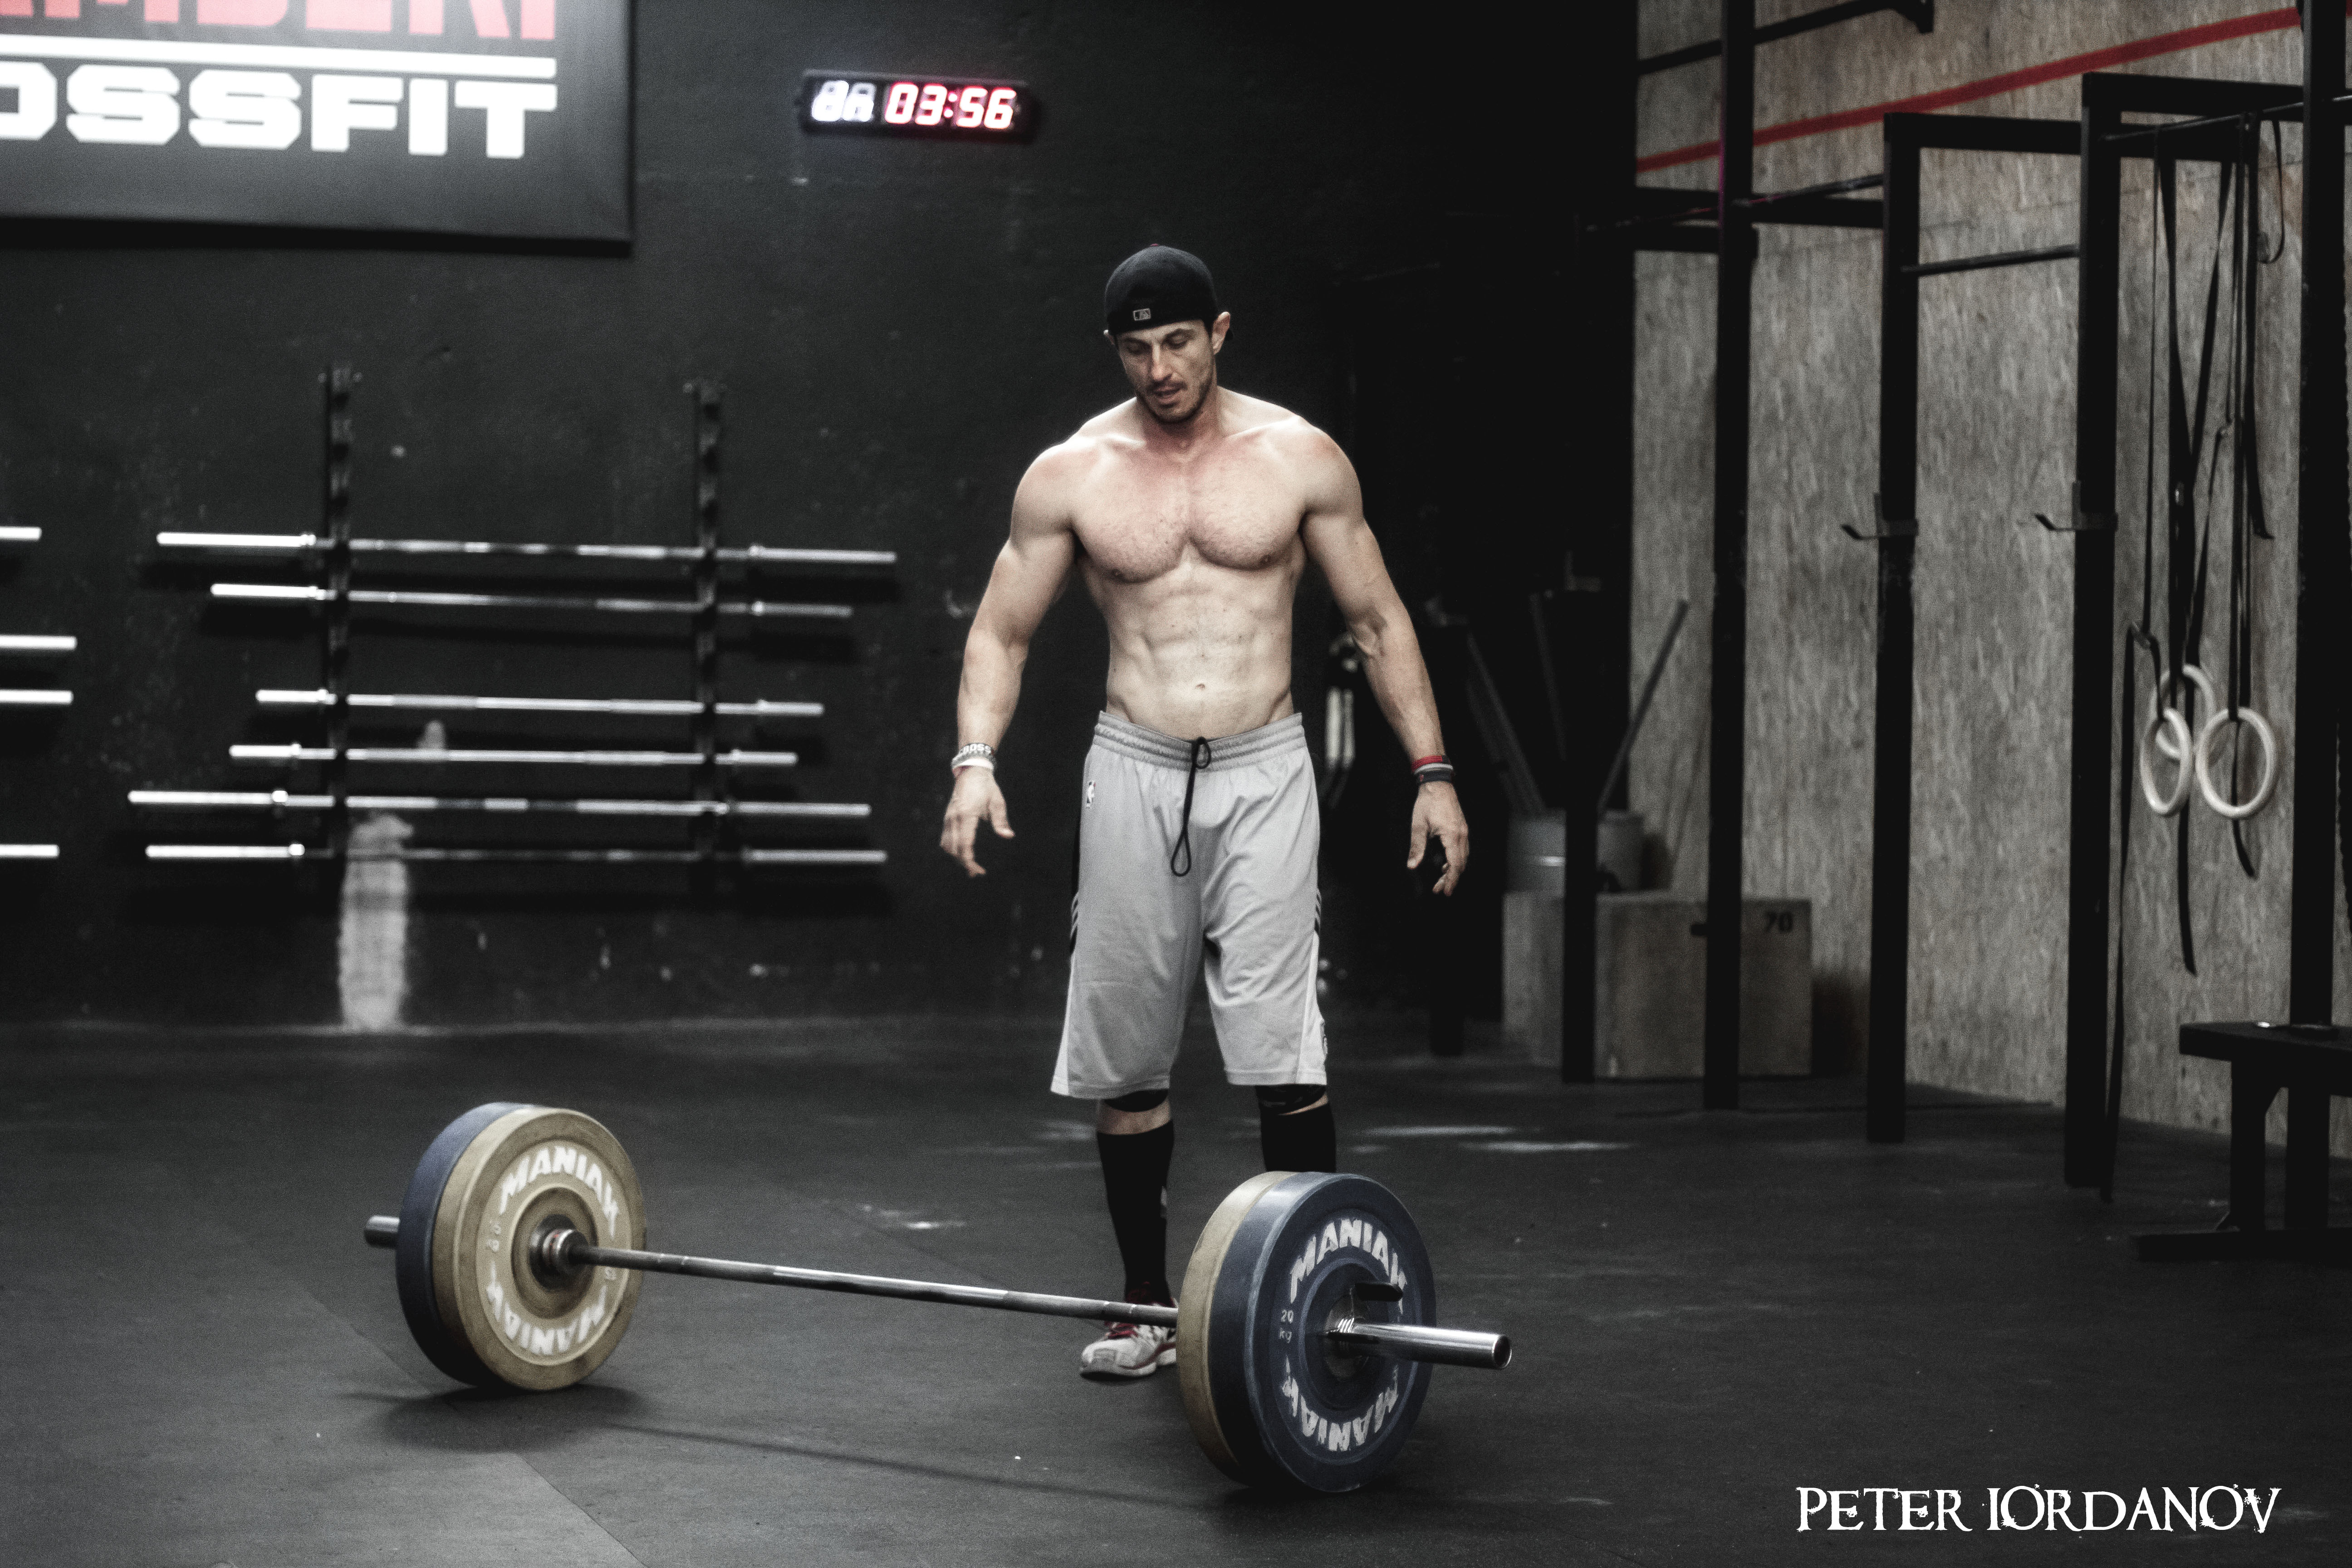 PETER IORDANOV